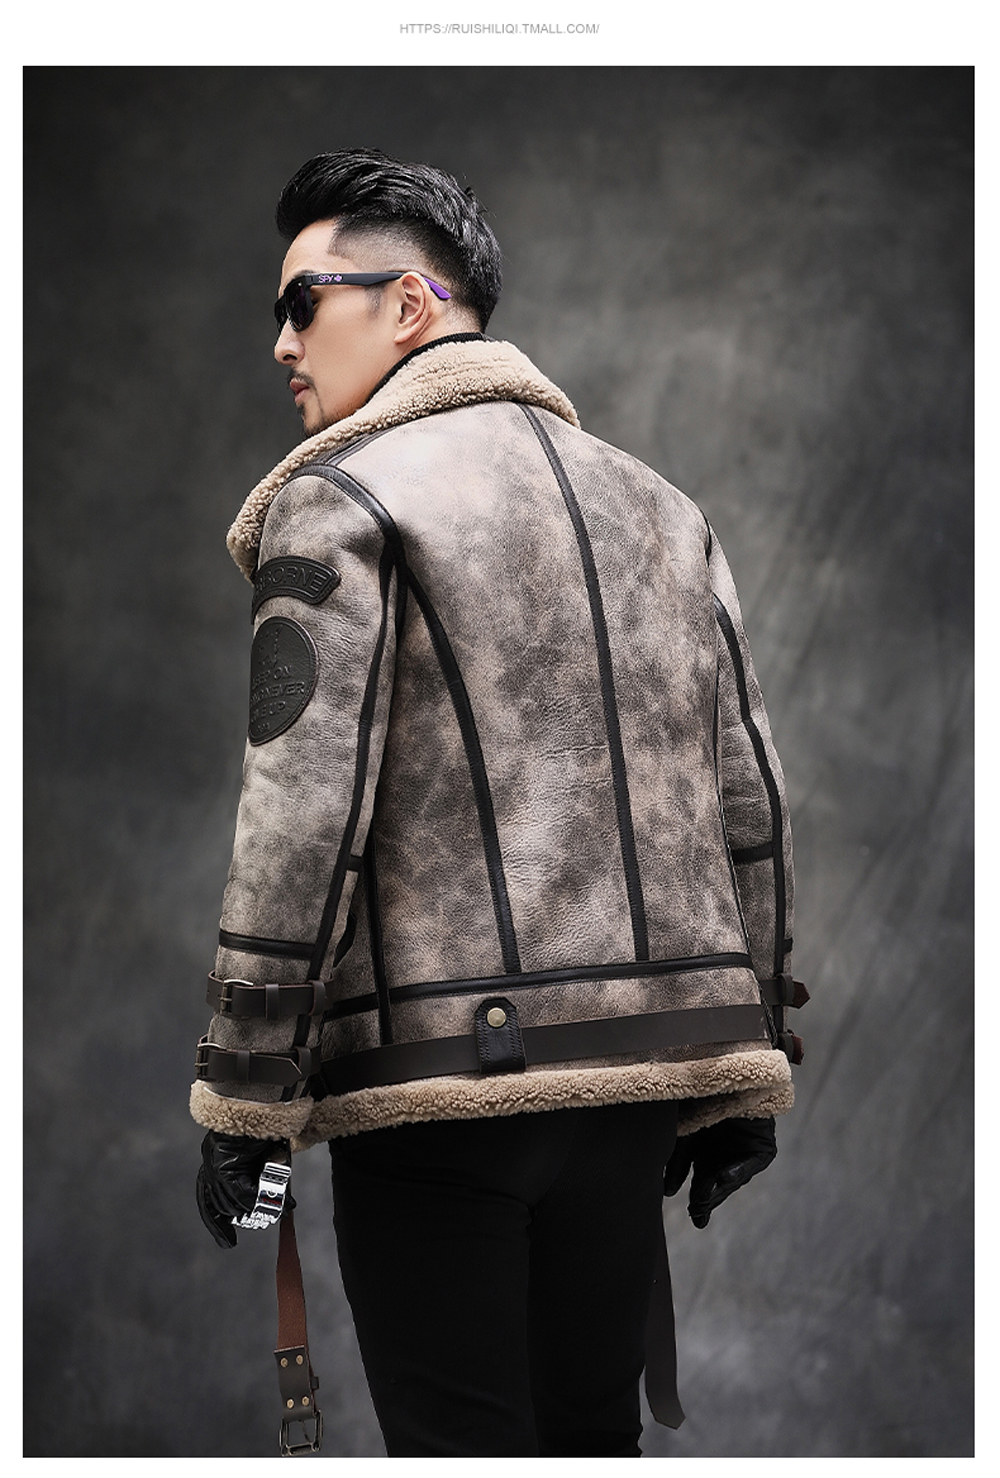 H180016cb58a64b5491eb7548796bab883 2019 Fashion 100% Quality Real Sheepskin Fur Men Coat Genuine Full Pelt Sheep Shearling Male Winter Jacket Brown Men Fur Outwear